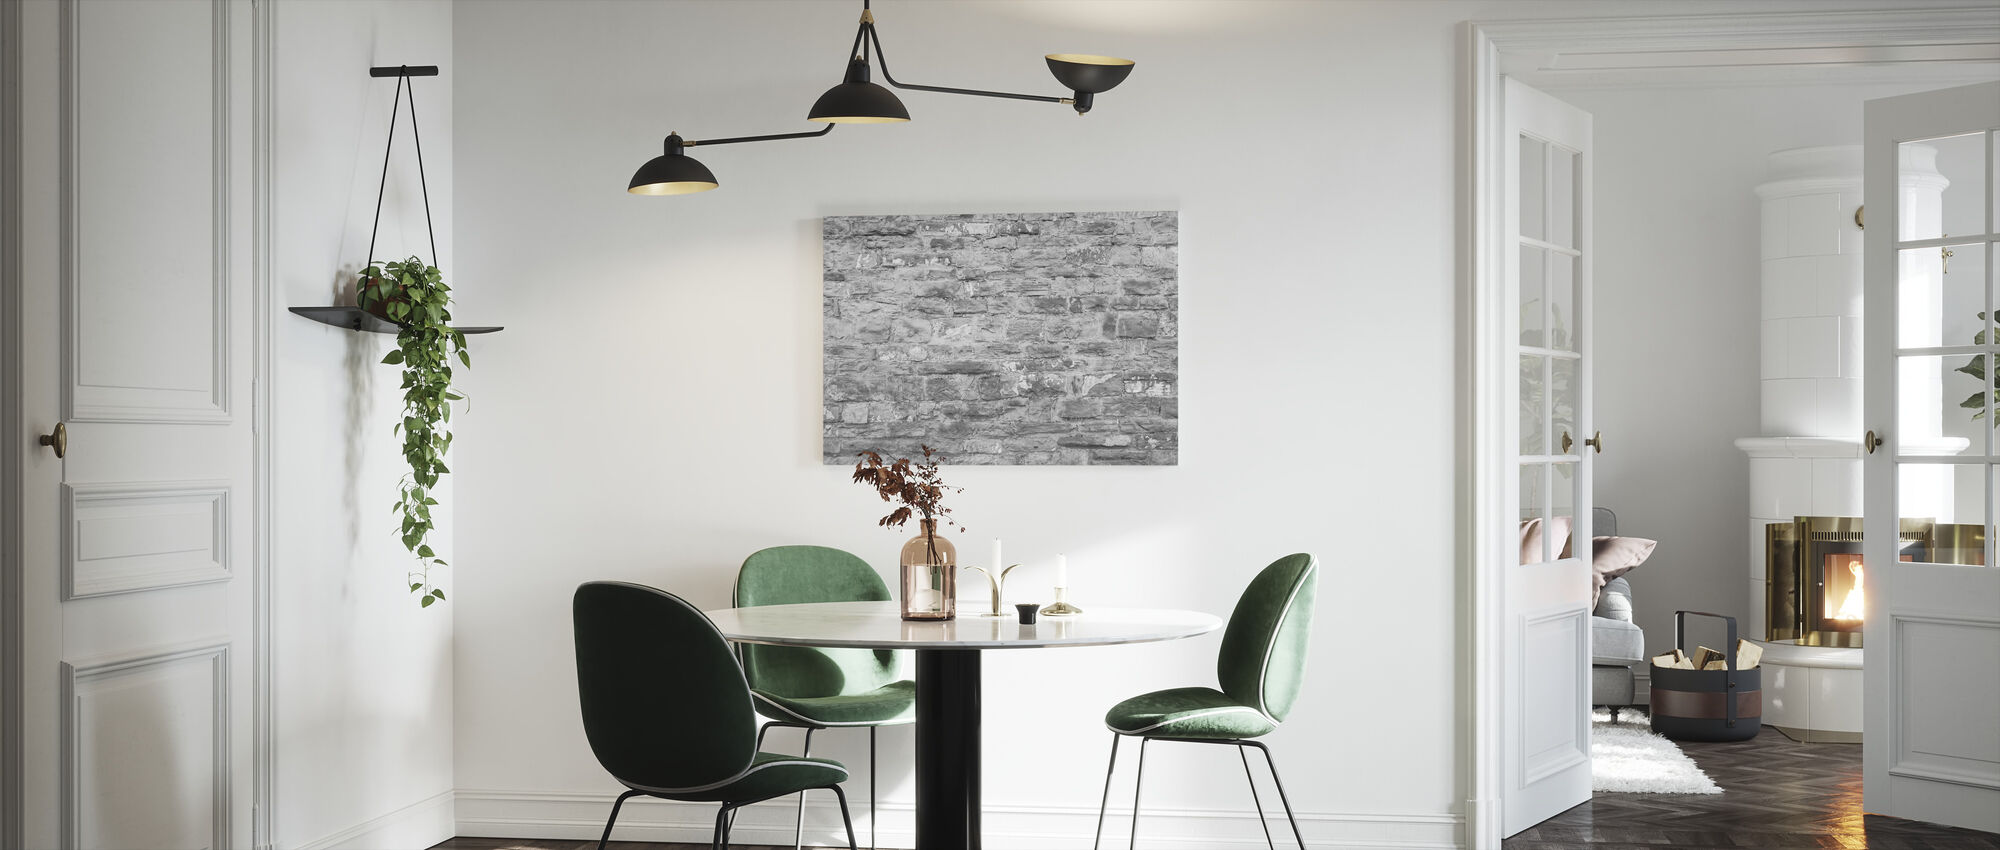 Bedekte bakstenen muur - Canvas print - Keuken